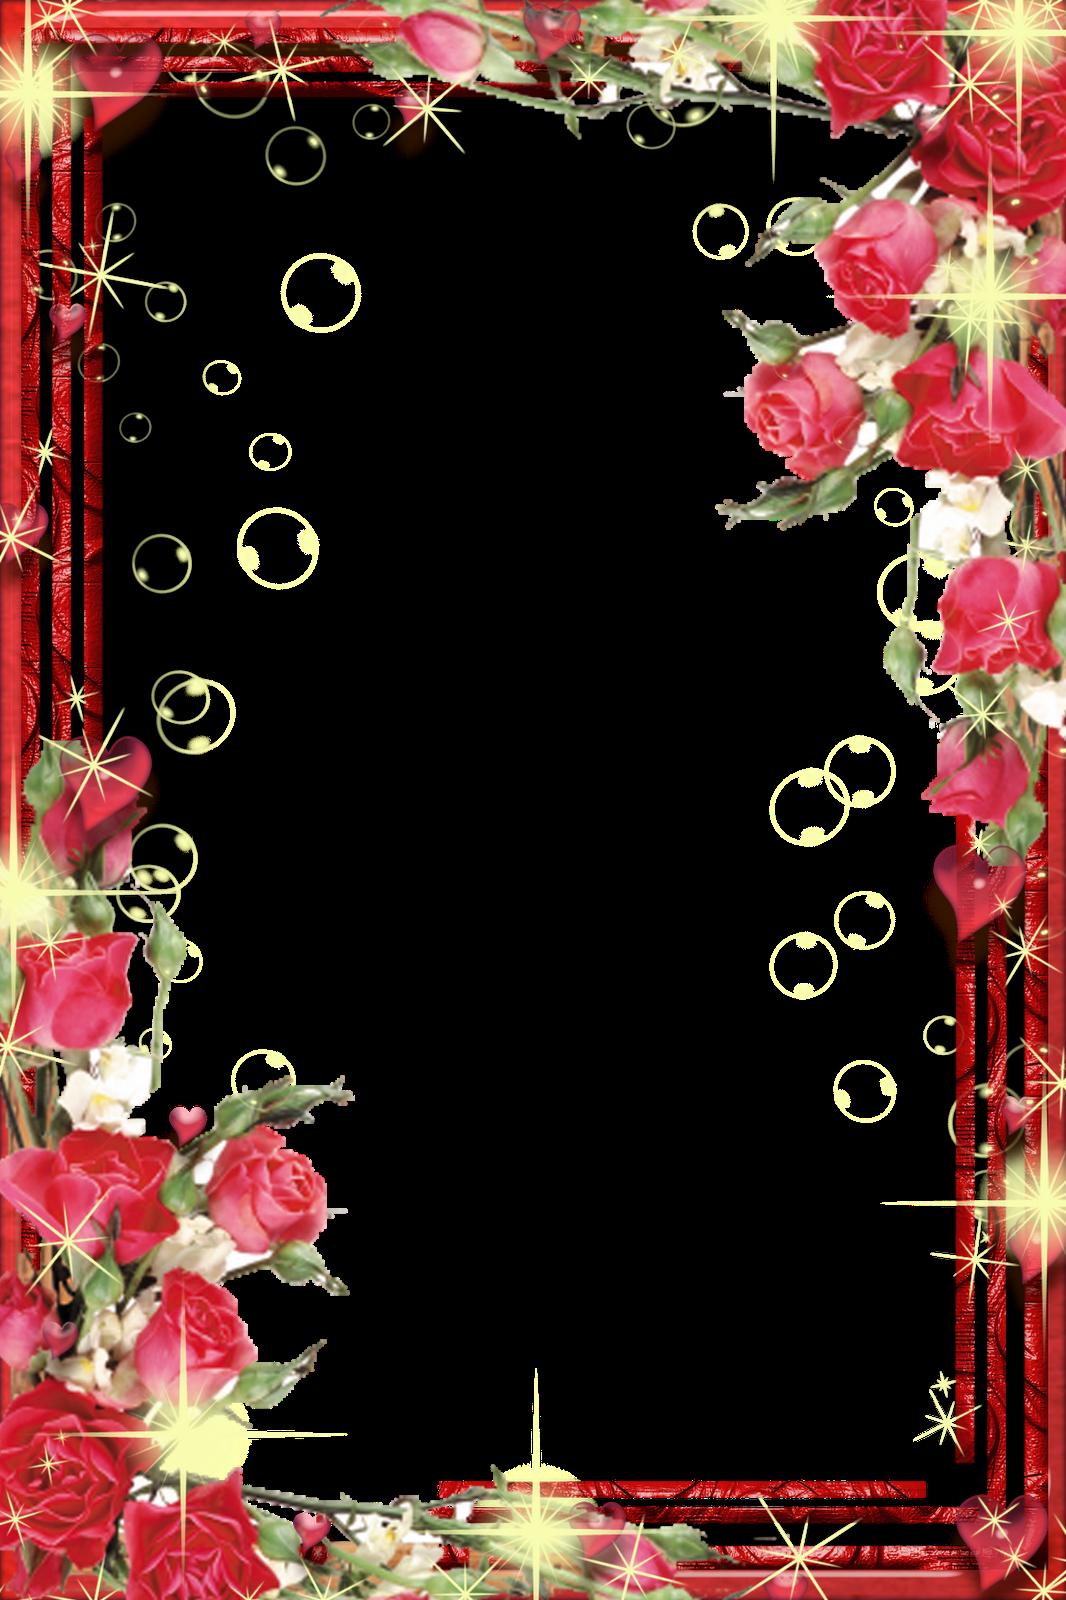 Frame png frames png san valentin 7 central photoshop frames frame png frames png san valentin 7 central photoshop jeuxipadfo Images